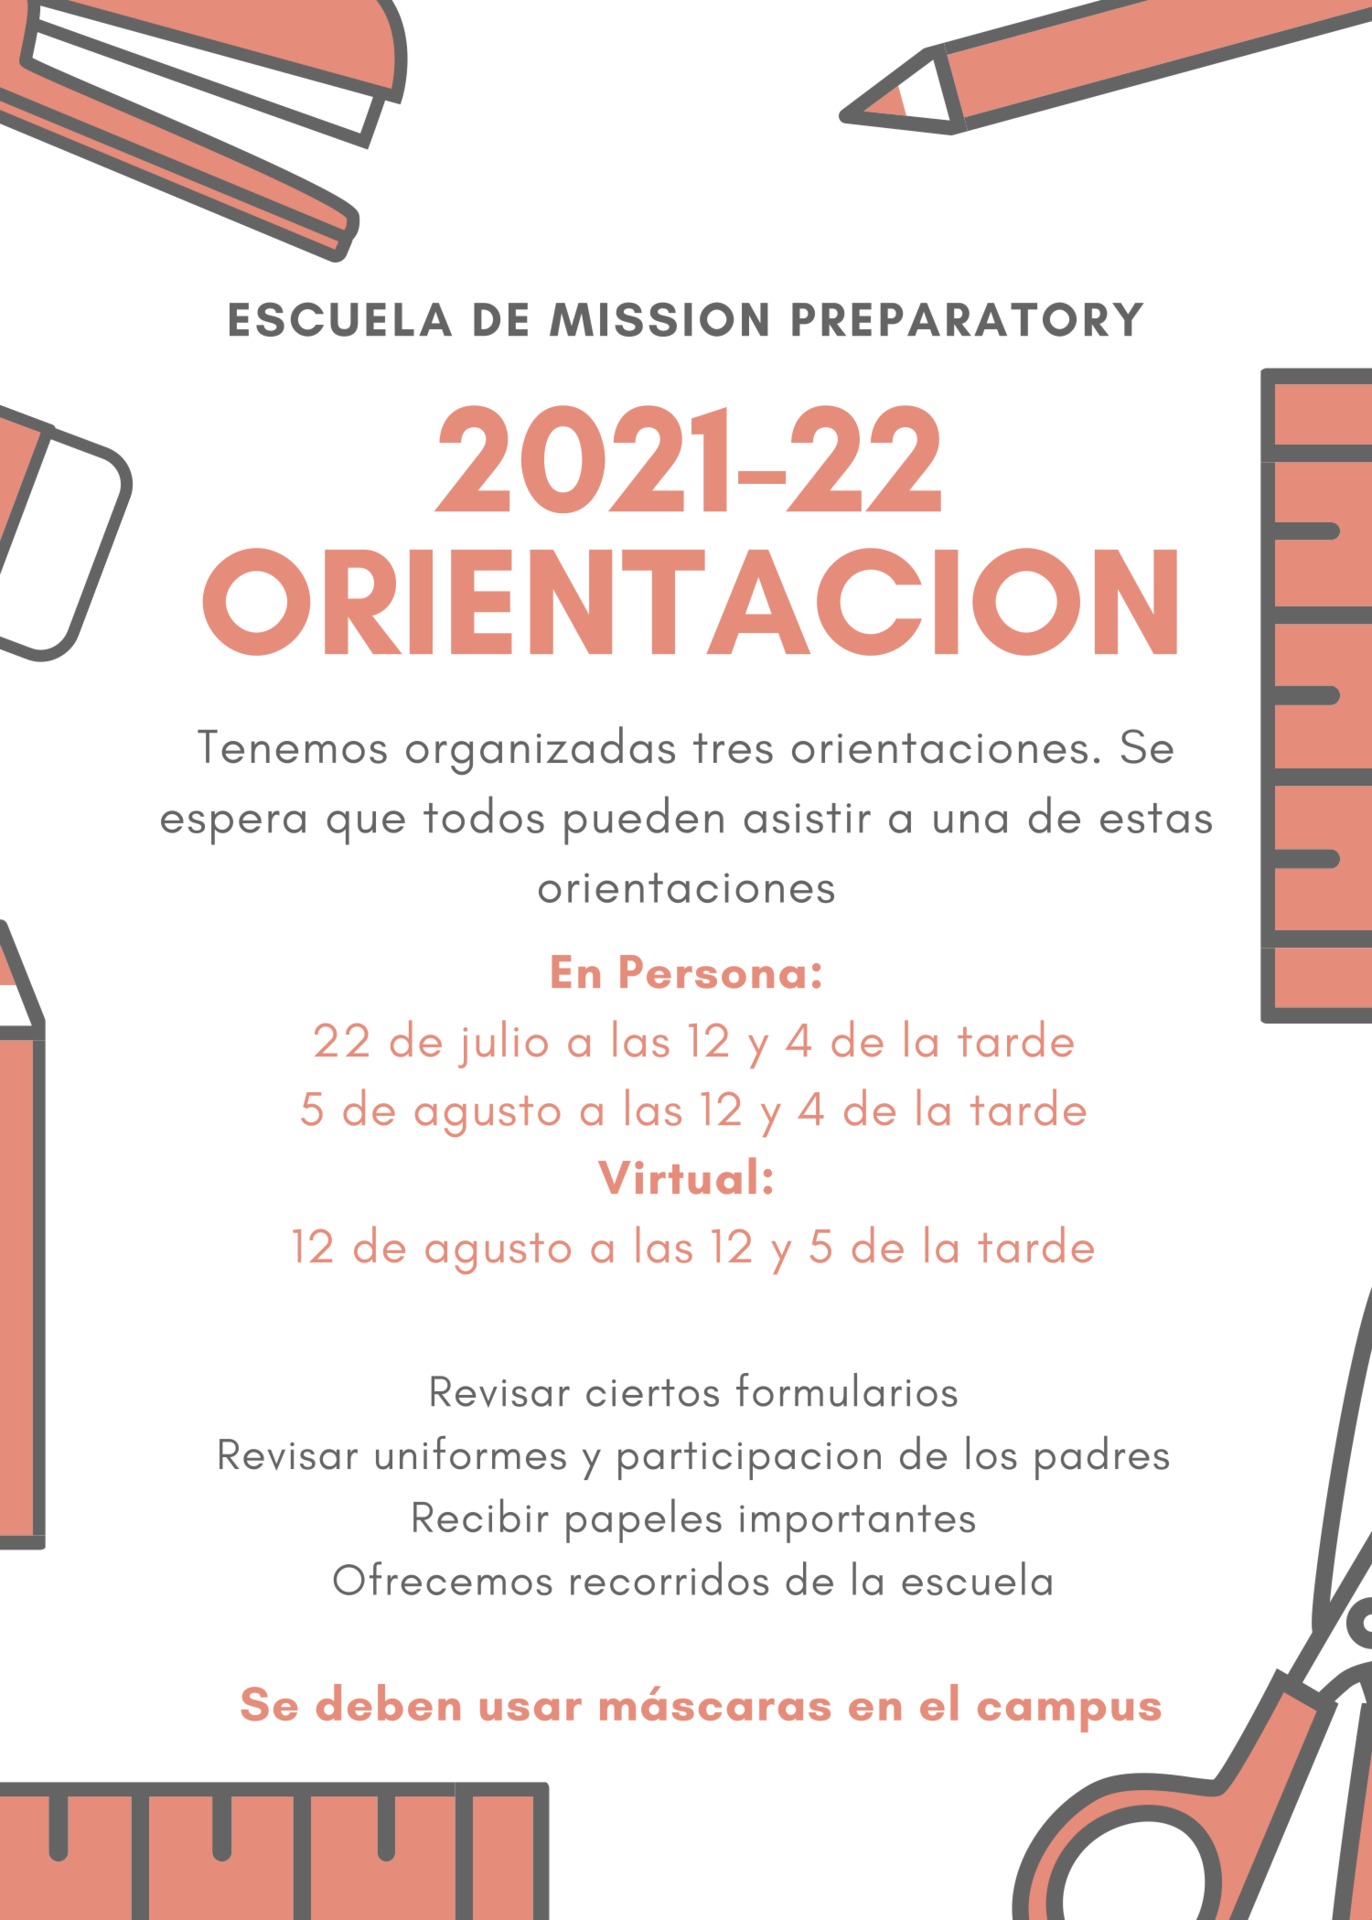 Orientation (ES)